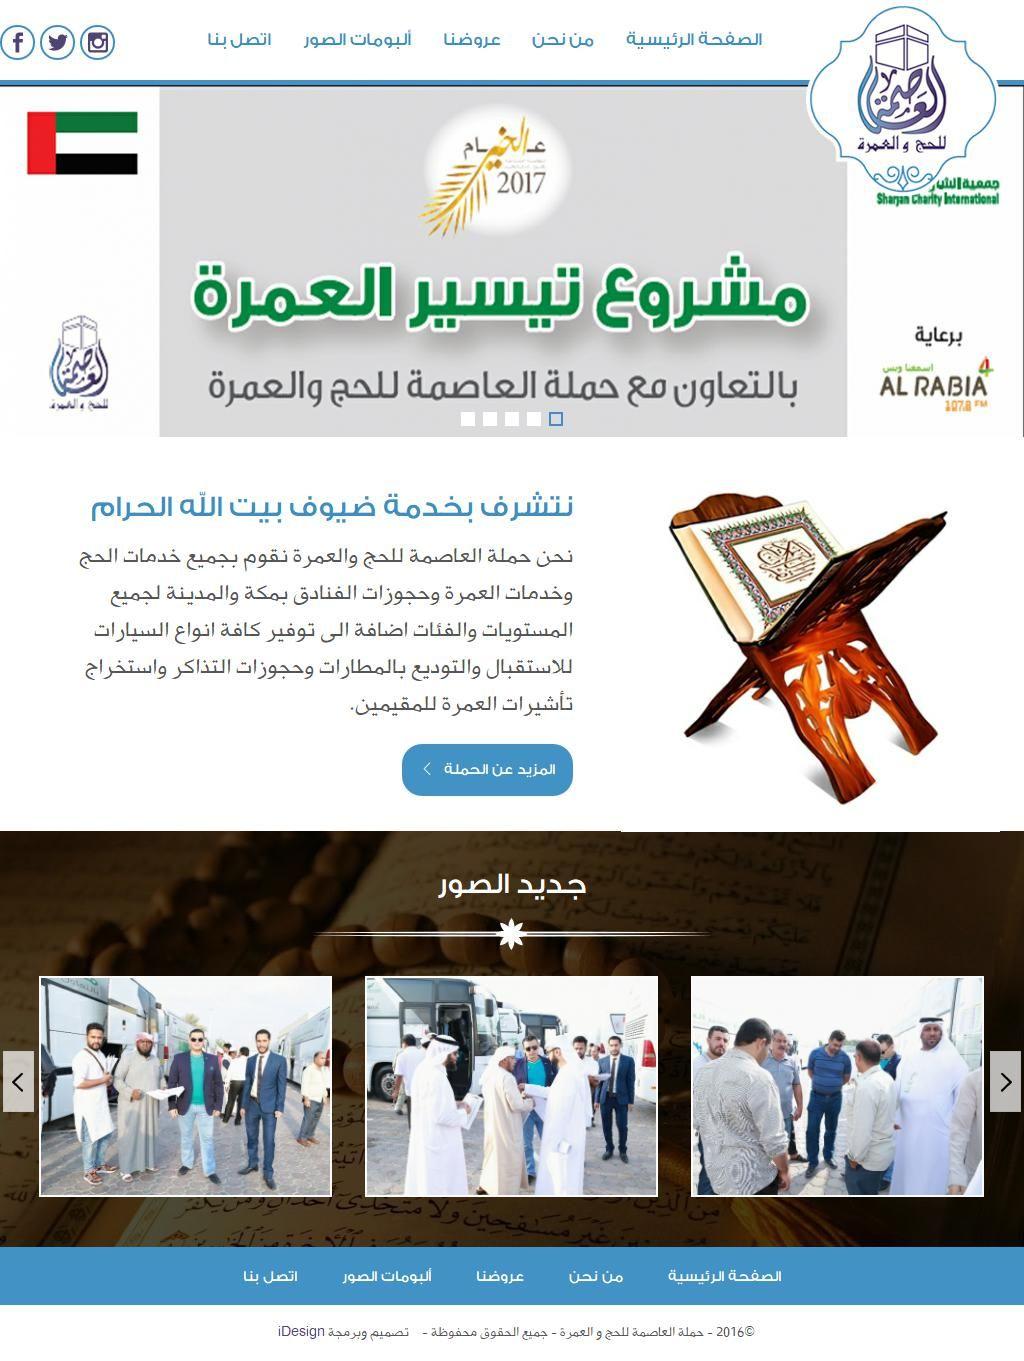 Al Asemah Hajj Umrah Travel Agency 11 Sheikh Saqr Bin Khalid Al Qassimi Street 1 Floor Office 104 Al Mahatta Al Qasimia Sha Travel Agency Dubai Travel